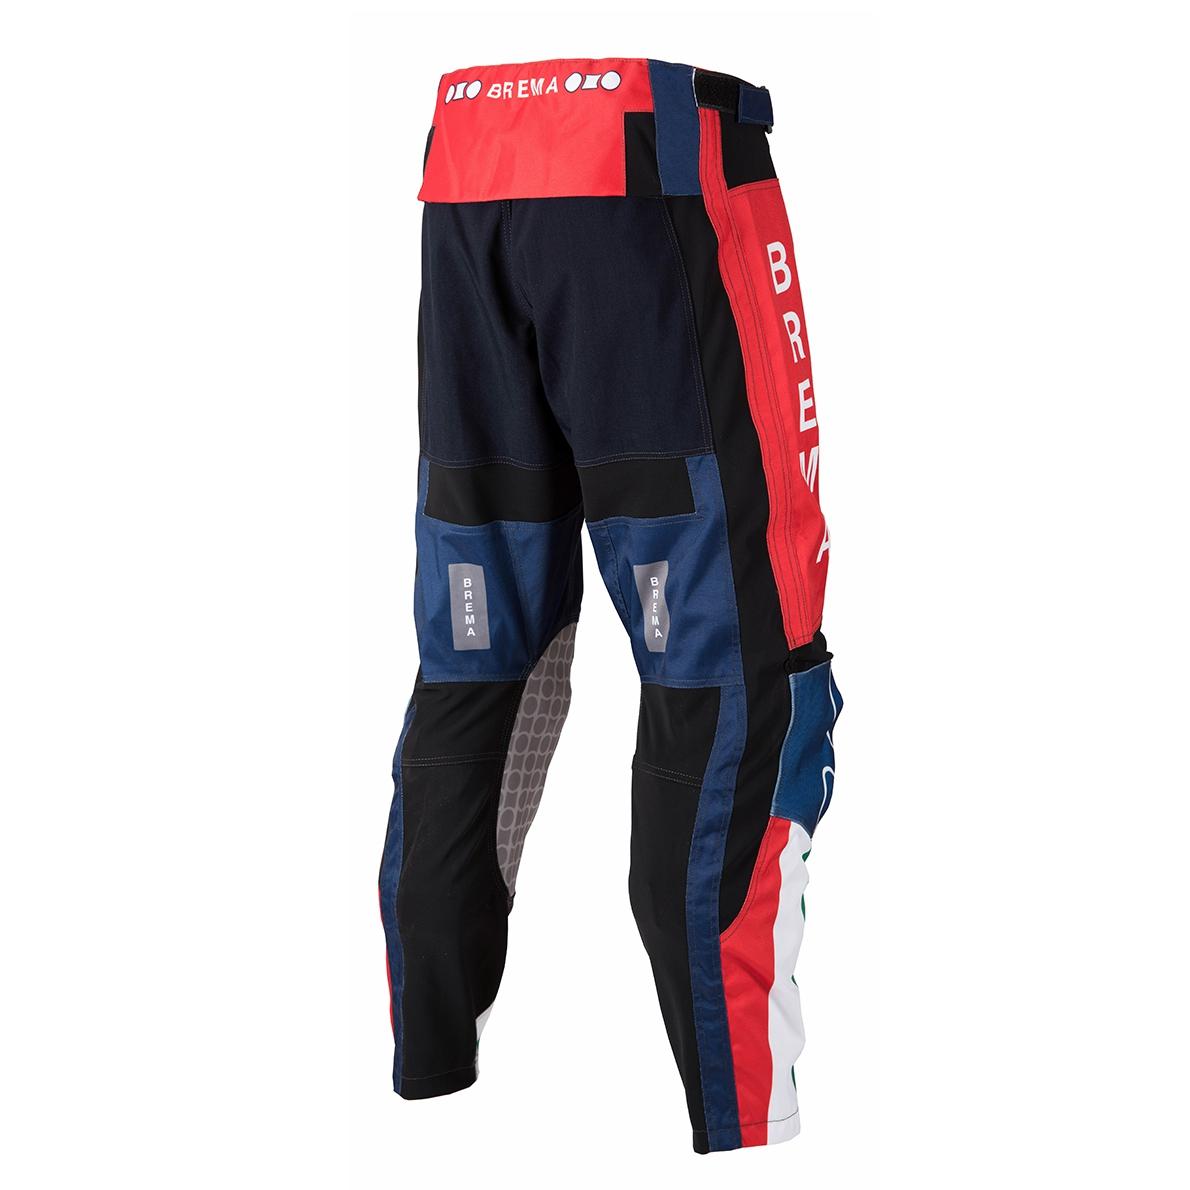 Pantalon BREMA TROFEO 2. Crédits : ©accessoires-moto-enduro-cross.fr 2017